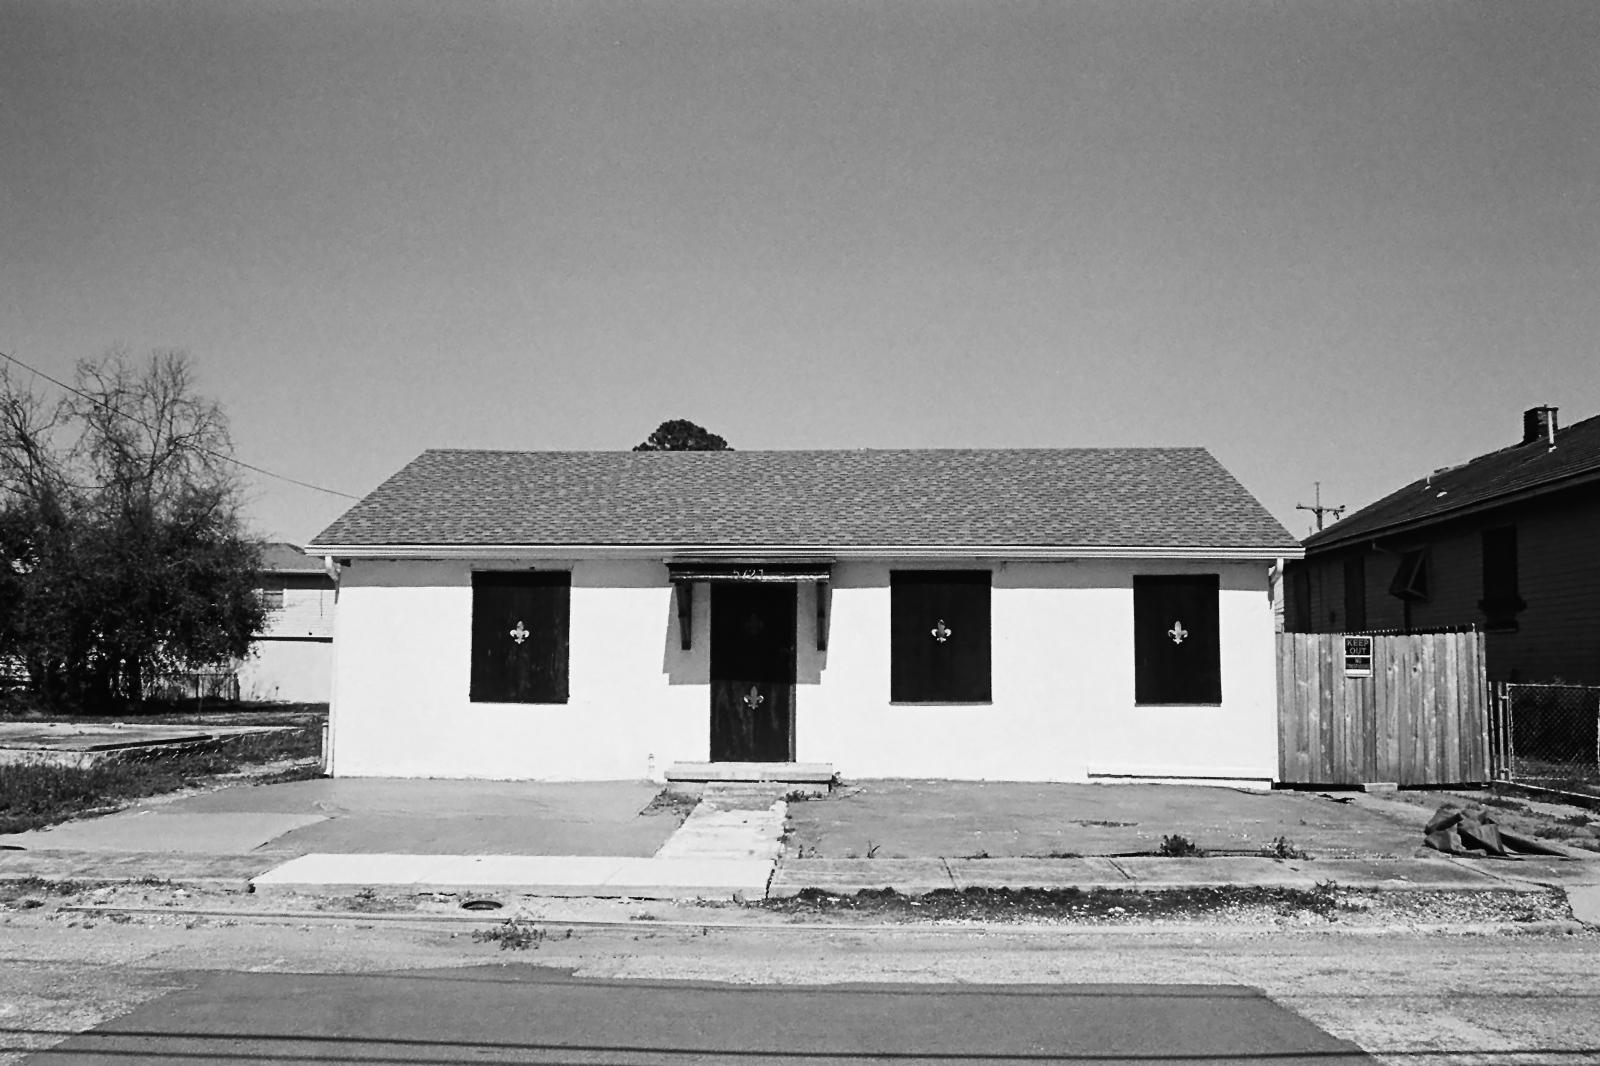 Art and Documentary Photography - Loading 9thwardhouselarge.jpg